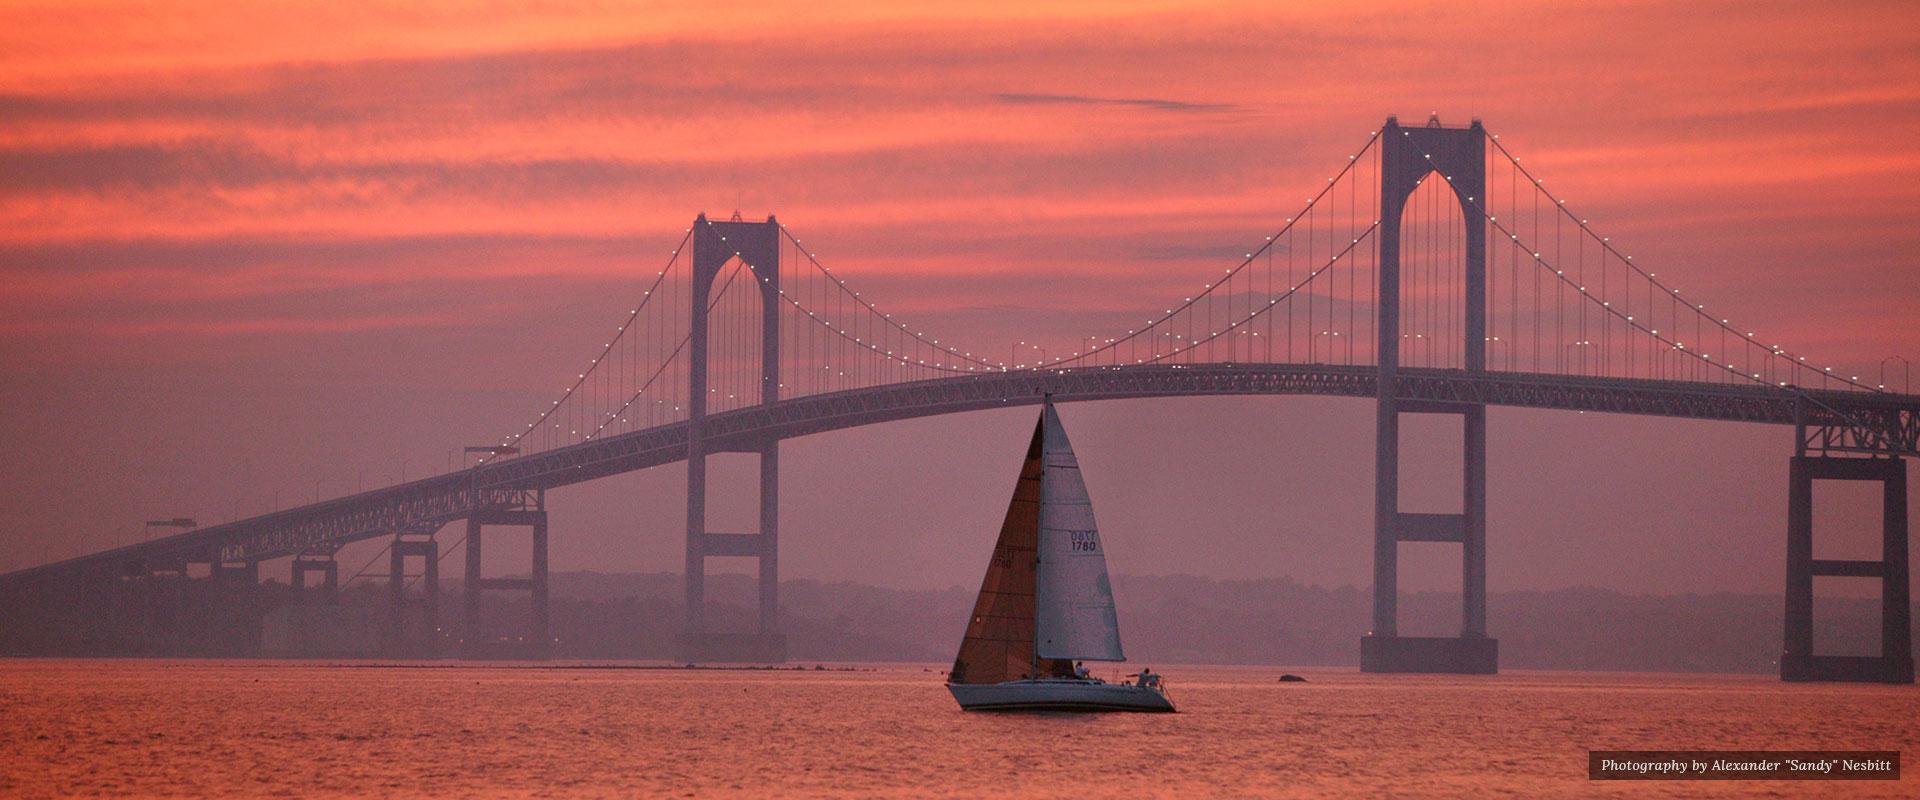 Yacth and bridge in purple sunset | Newport Inns of Rhode Island